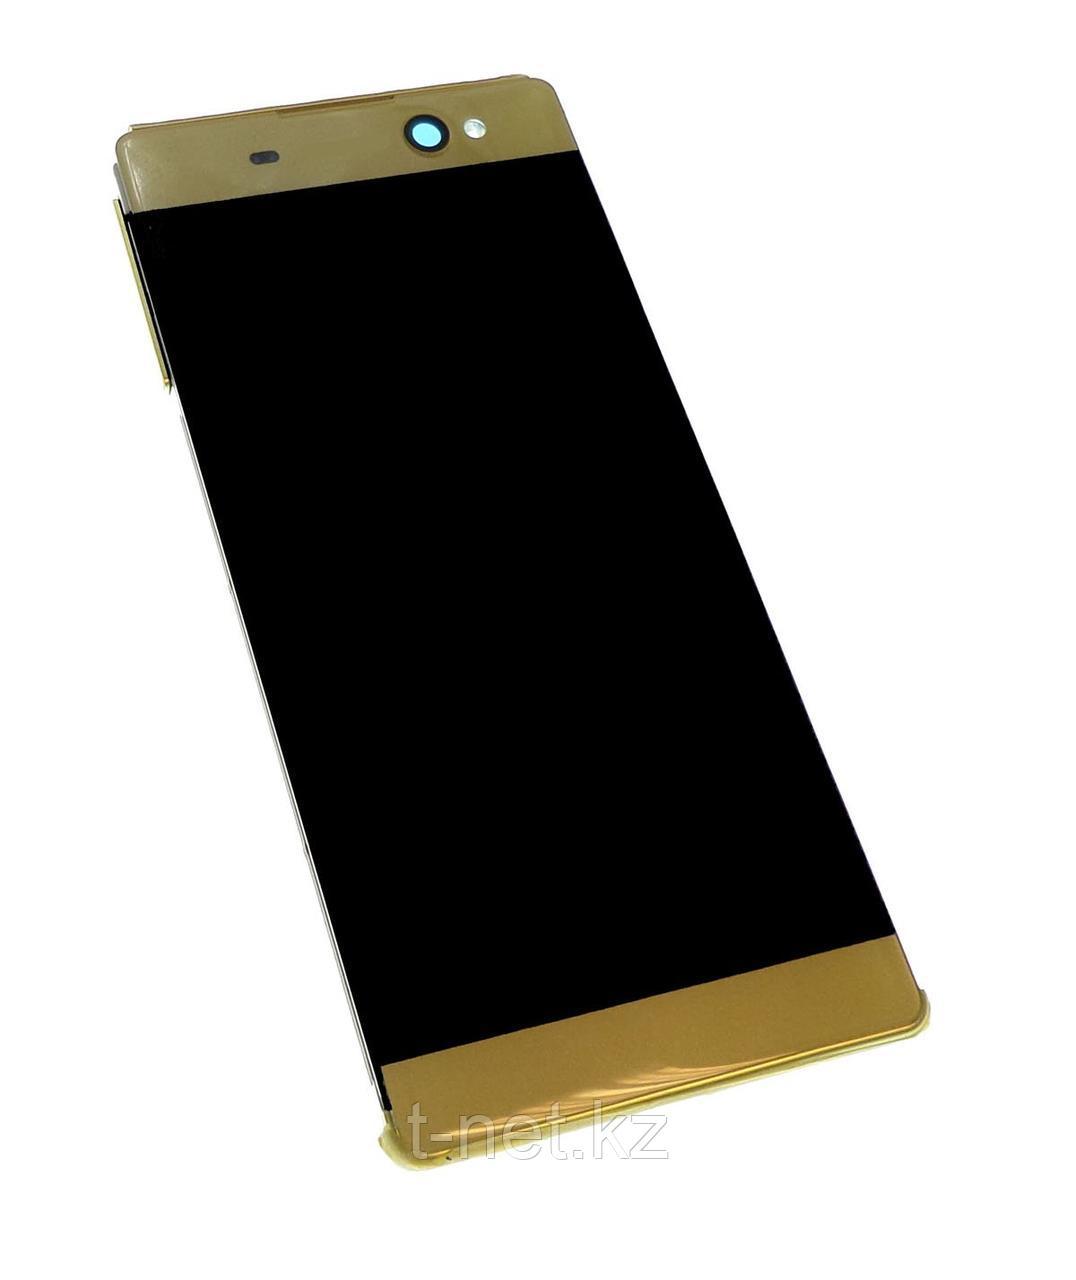 Дисплей SONY XA ULTRA F3112 (ОРИГИНАЛ) с сенсором, цвет золотистый